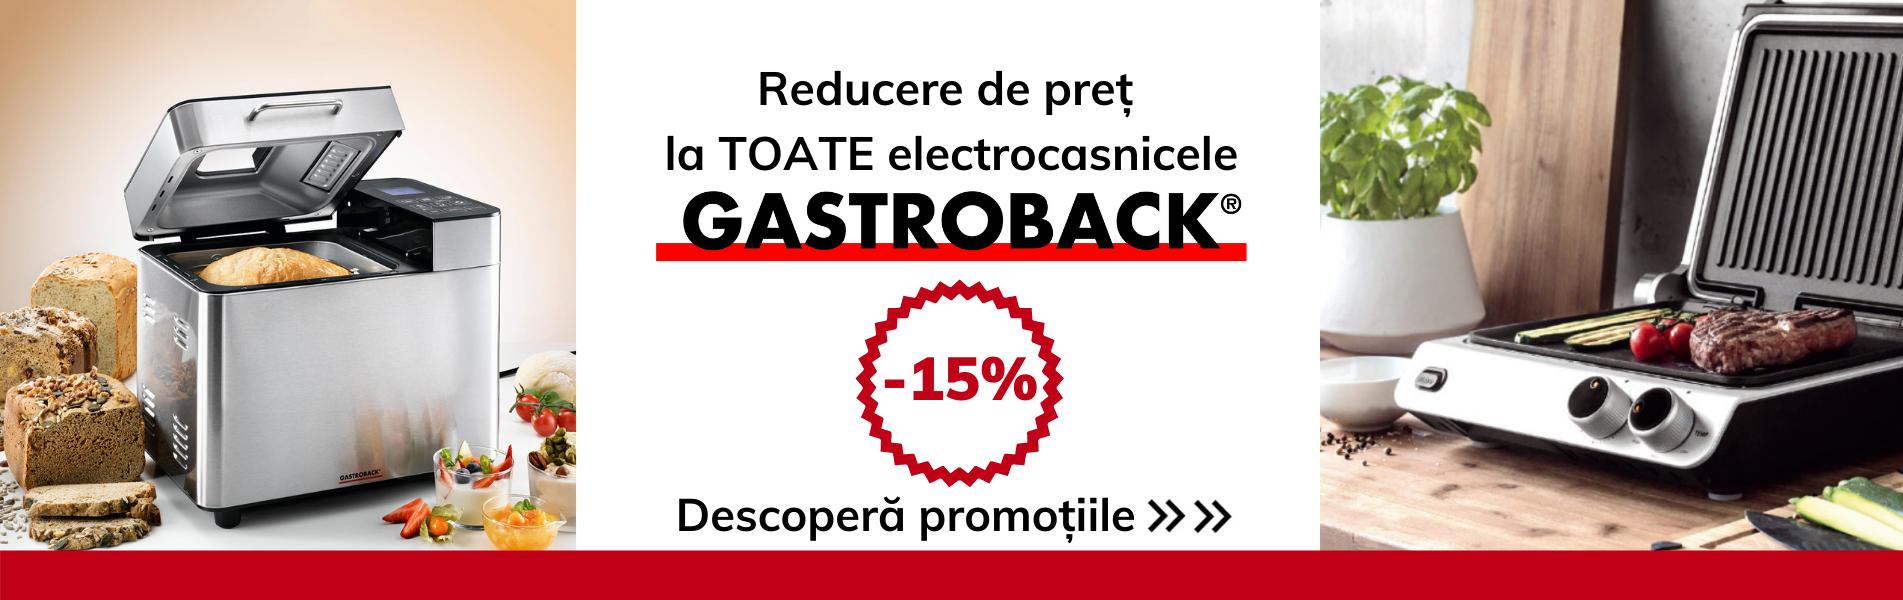 Gastroback promotie 15